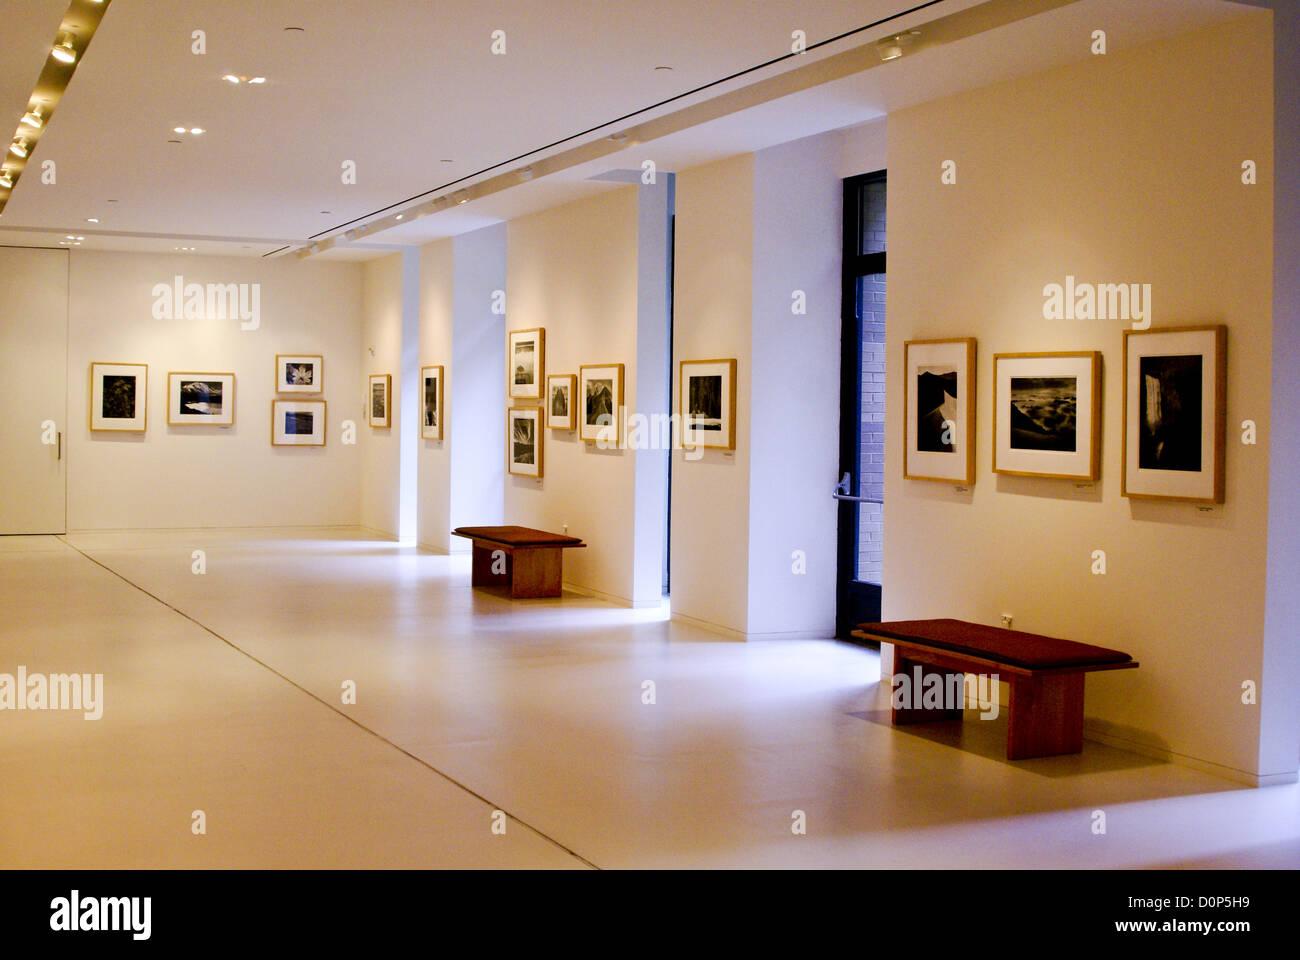 Art Gallery - Stock Image